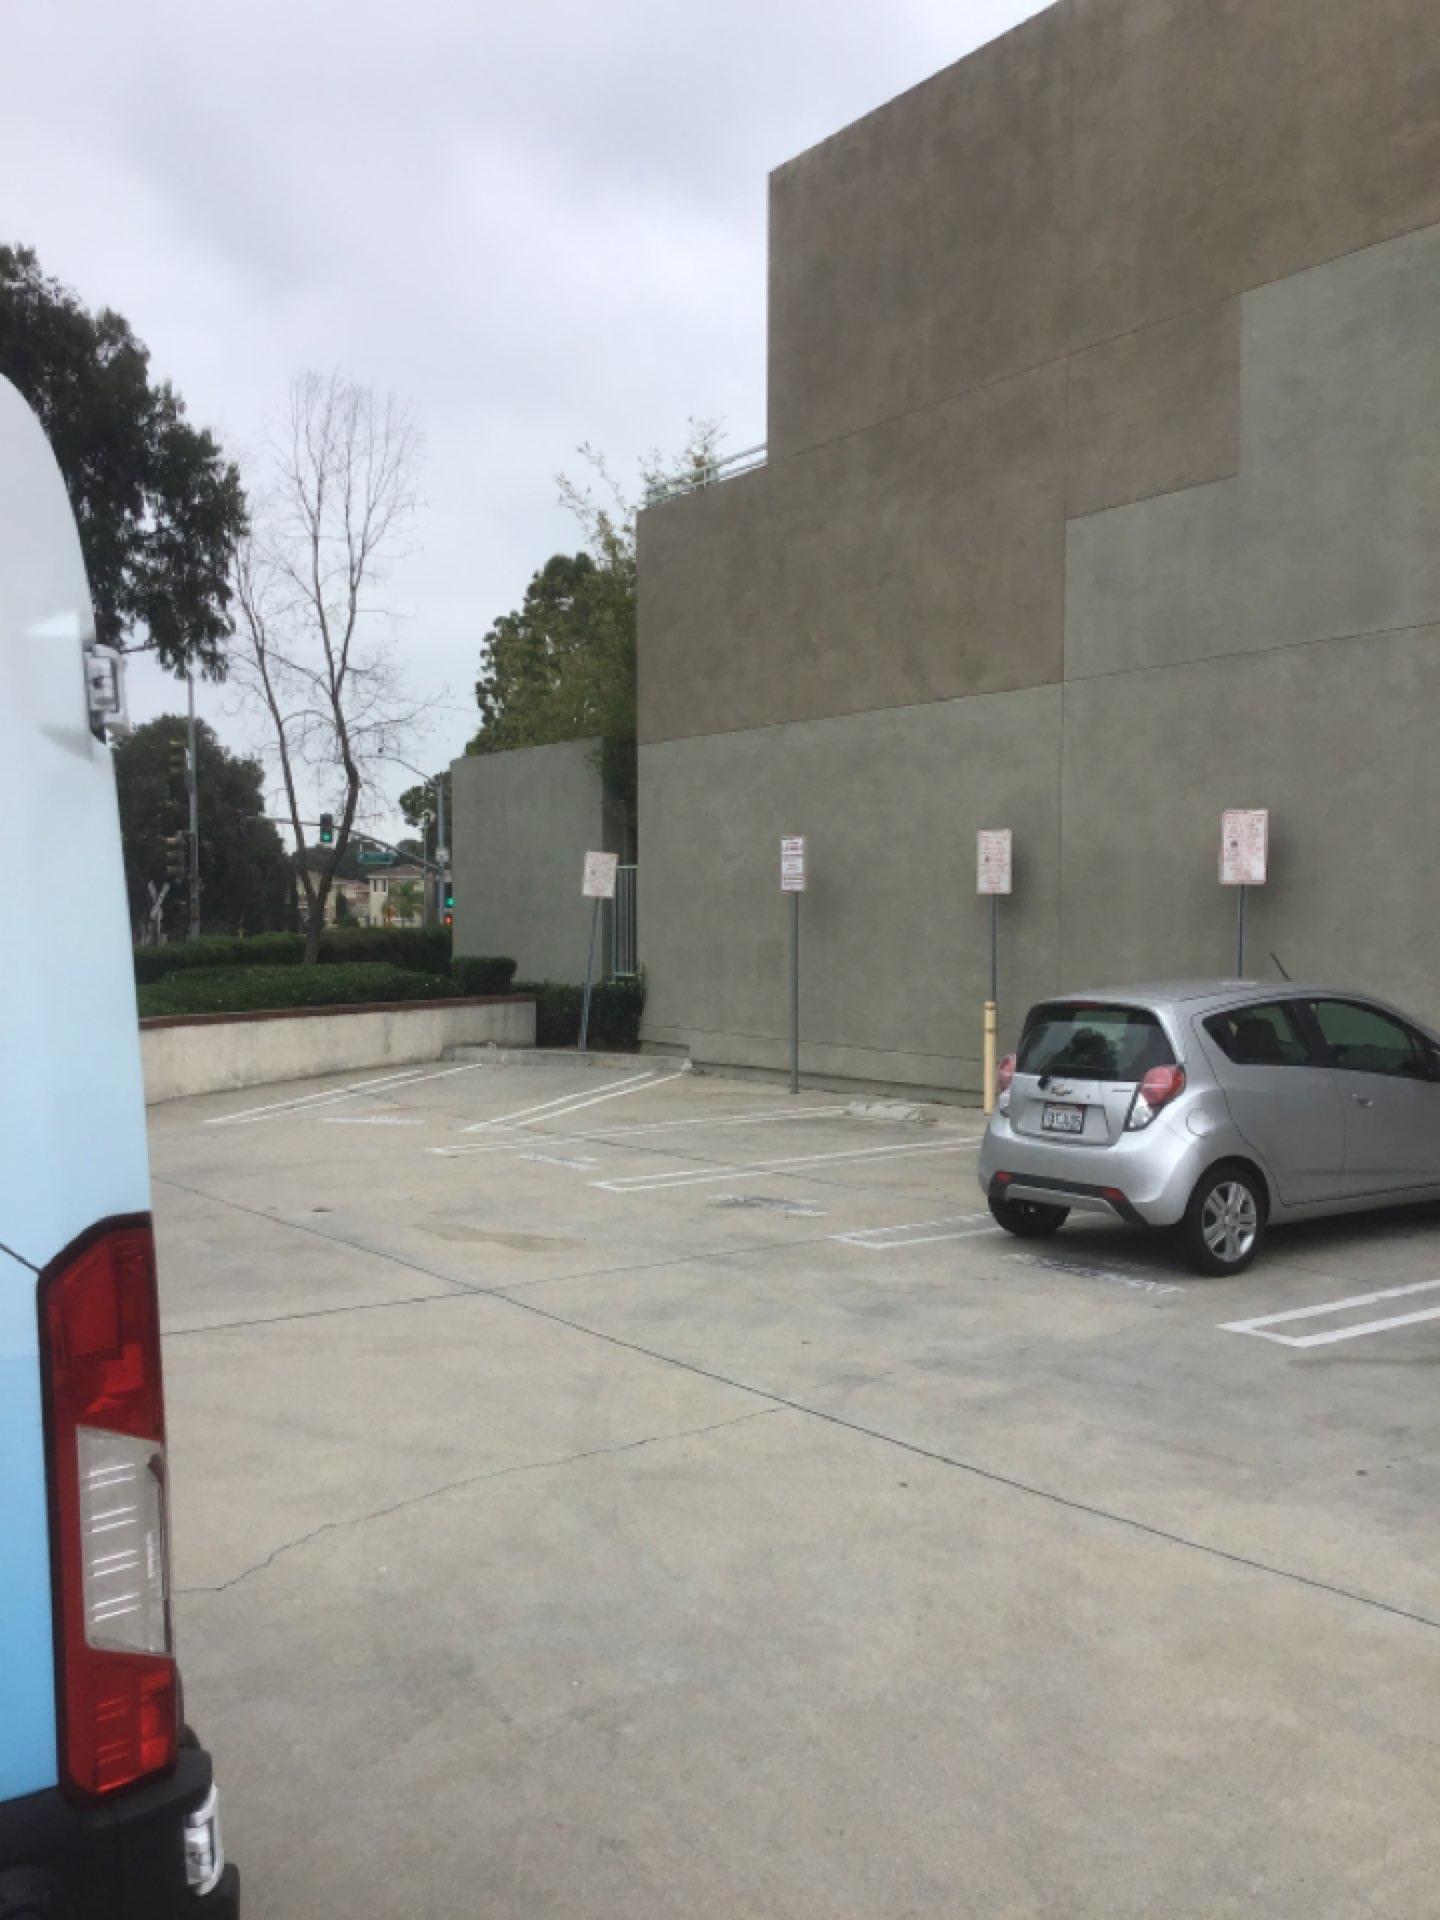 Torrance, CA -